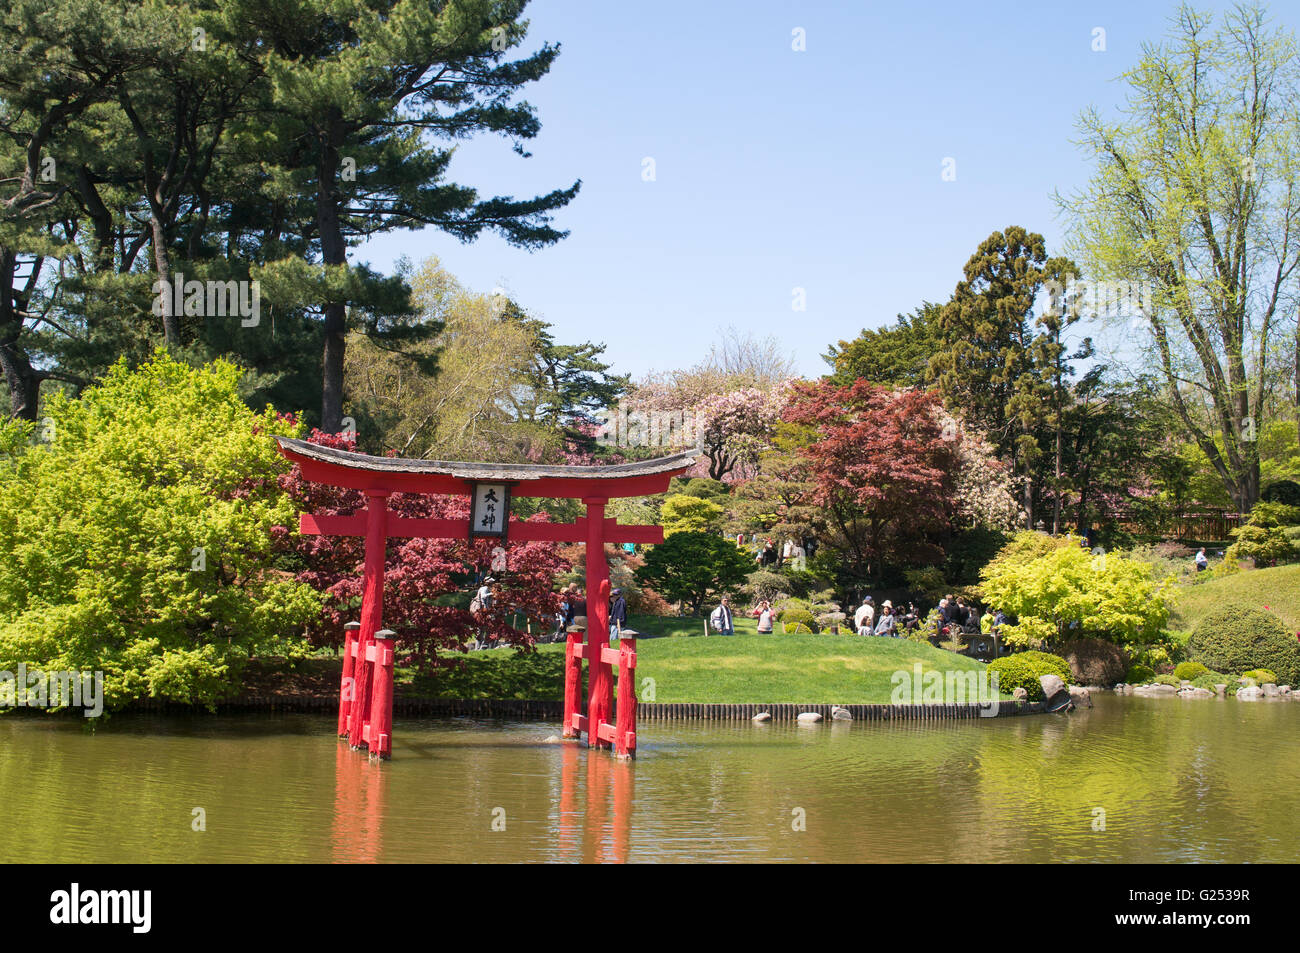 The Japanese Garden At Brooklyn Botanic Garden, New York, USA